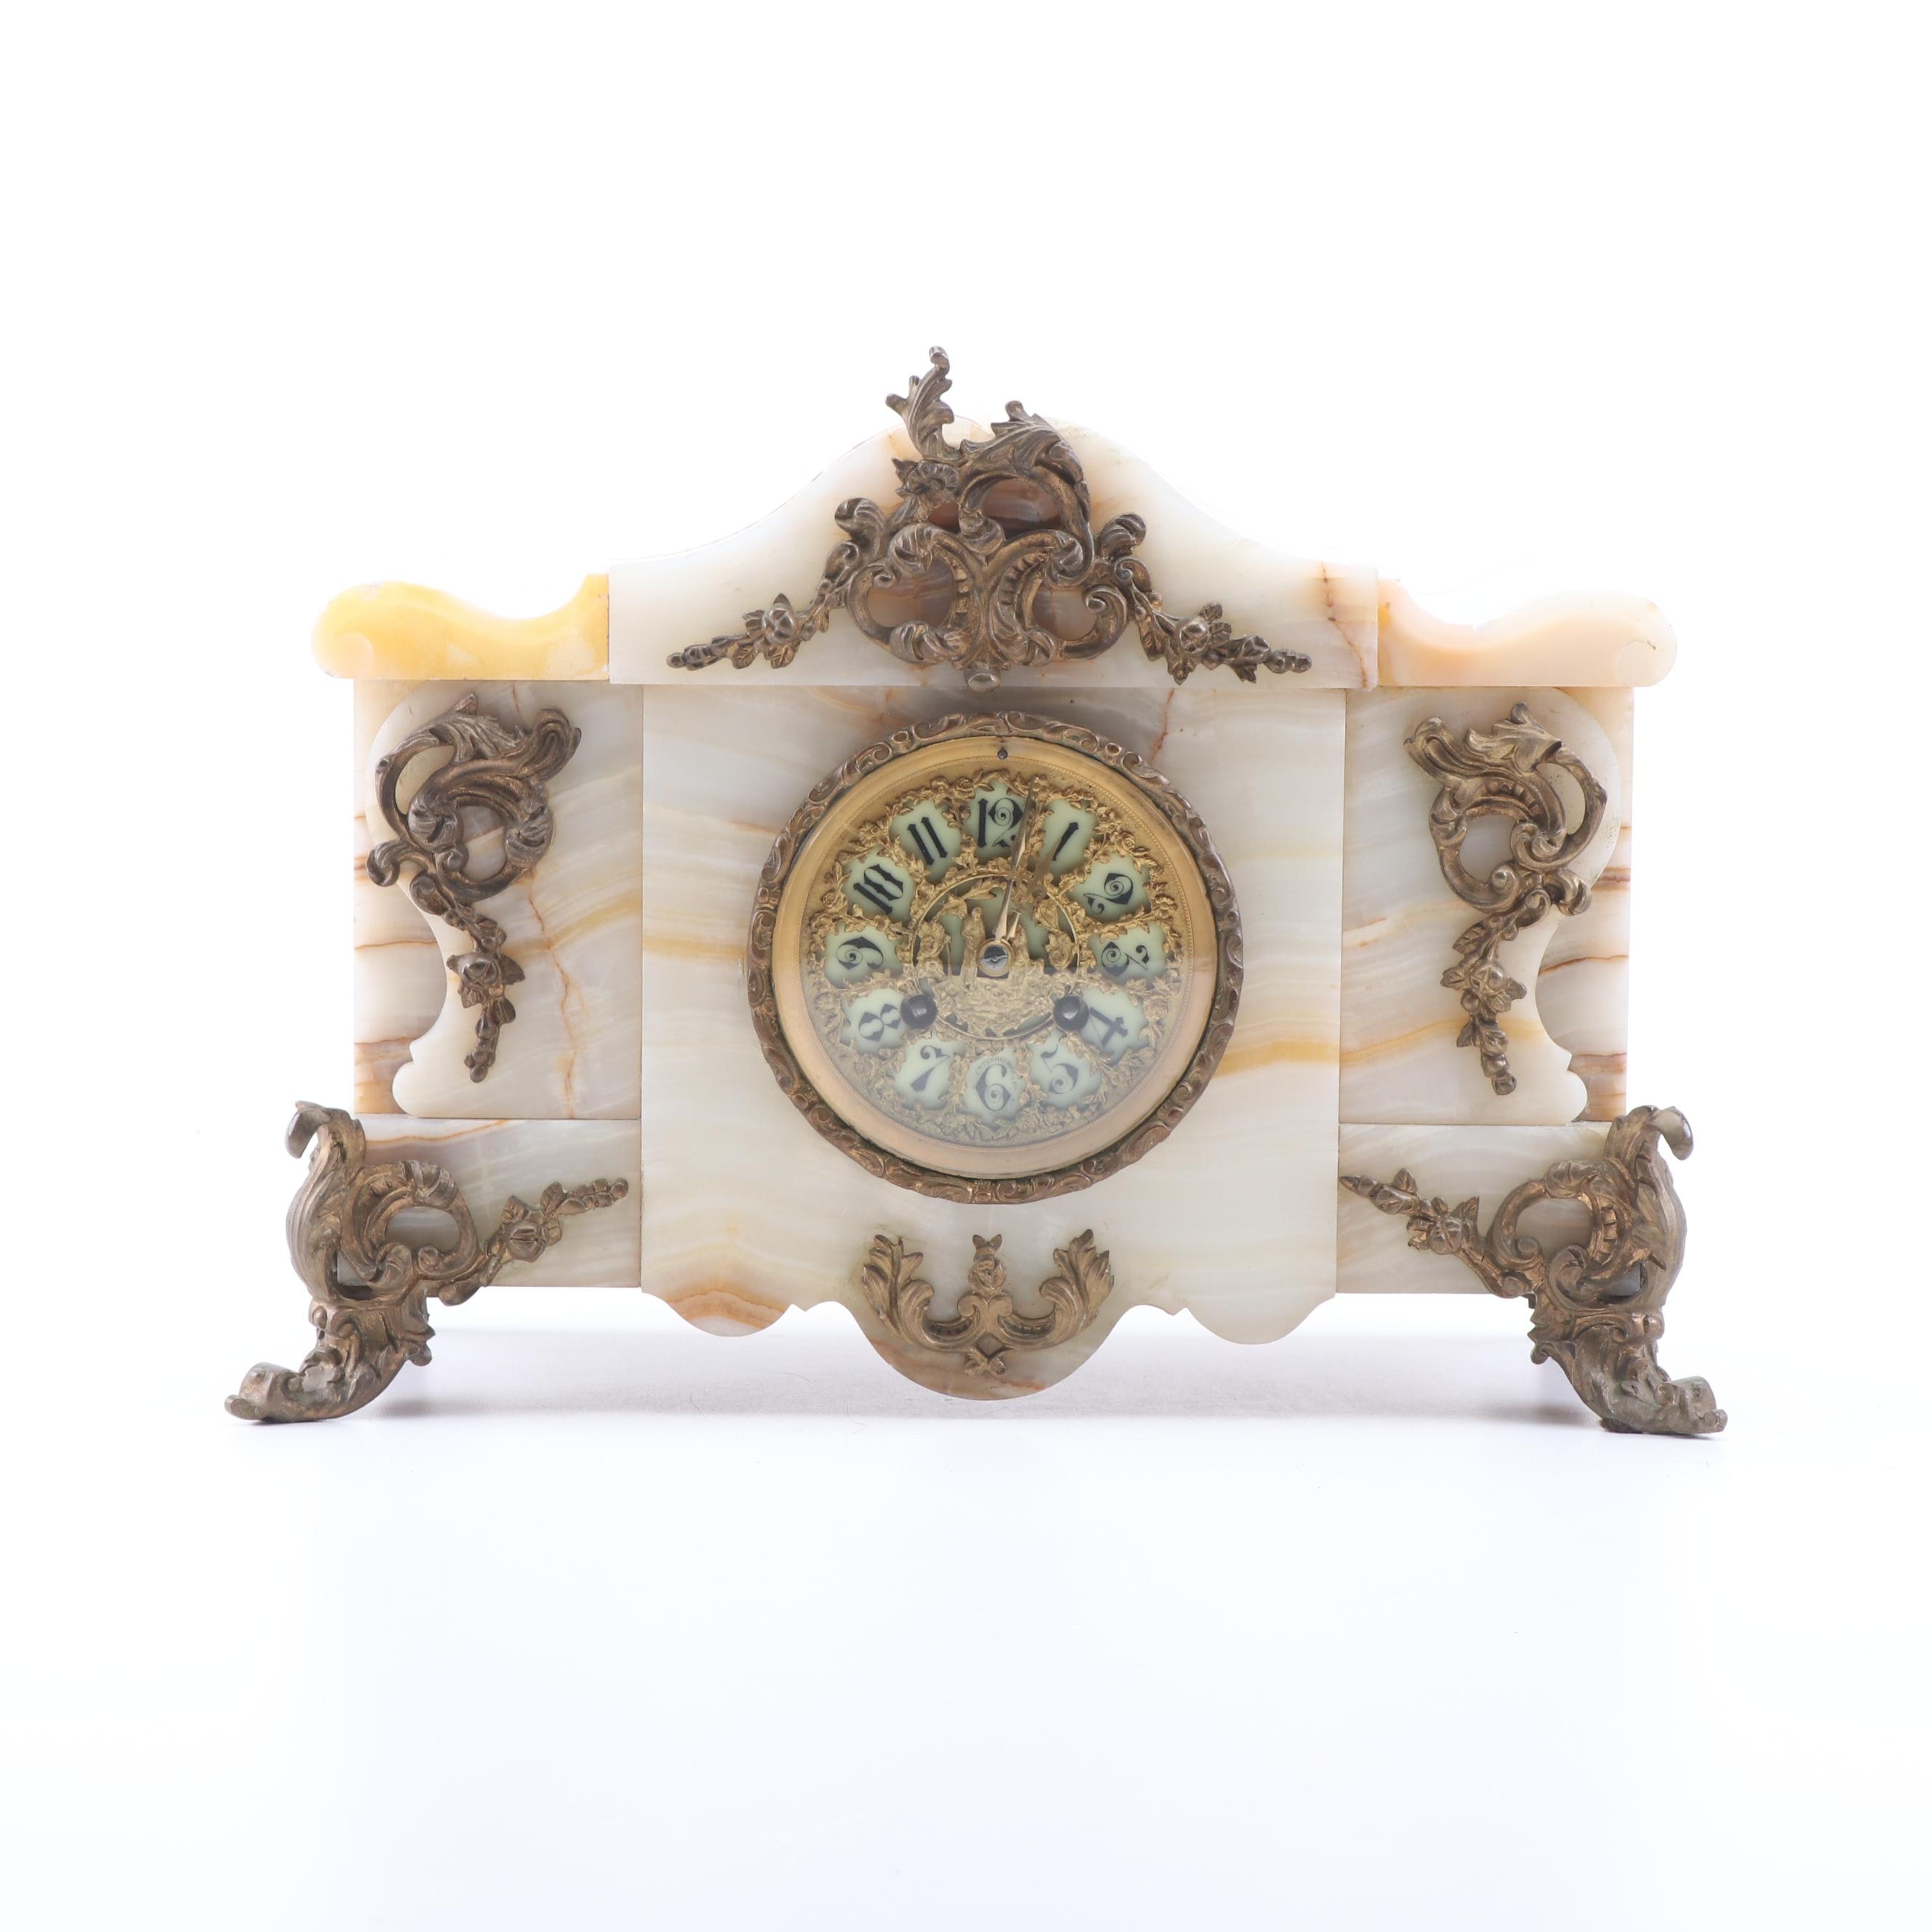 E.S. Ettenheimer Agate and Gilt Bronze Mounted Mantel Clock